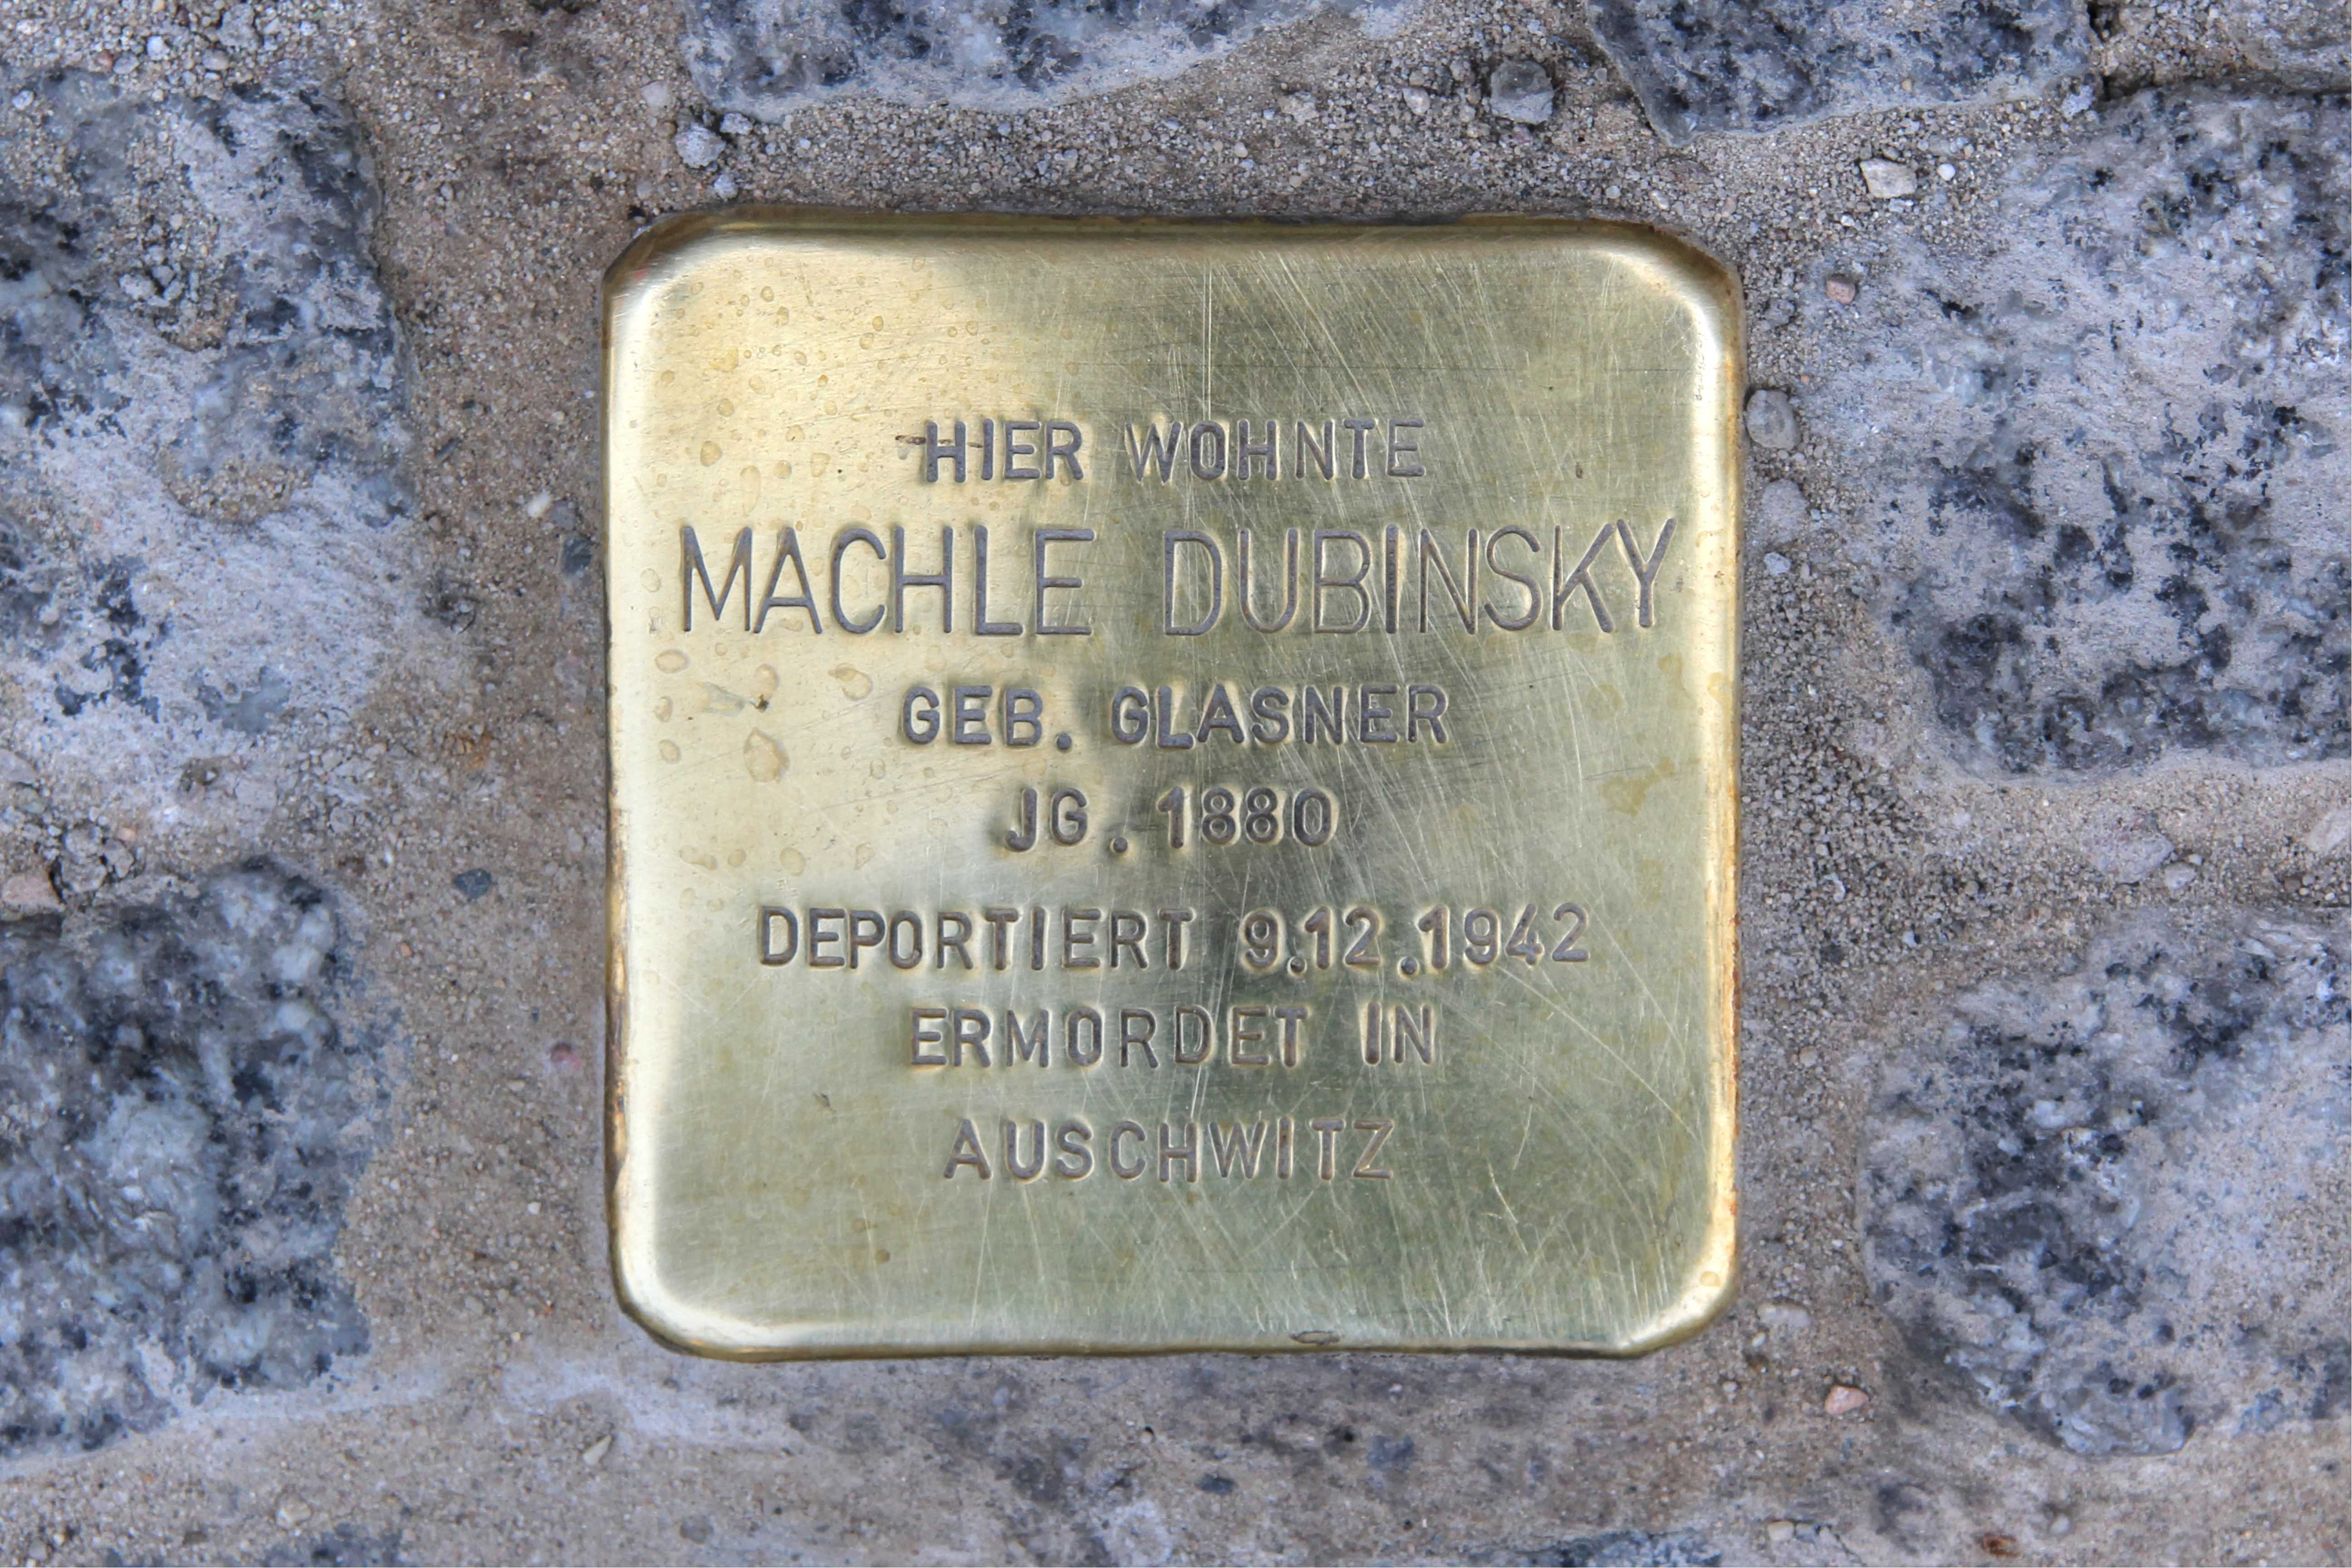 Stolpersteine 115: In memory of Machle Dubinsky (Rosenthaler Strasse 19) in Berlin